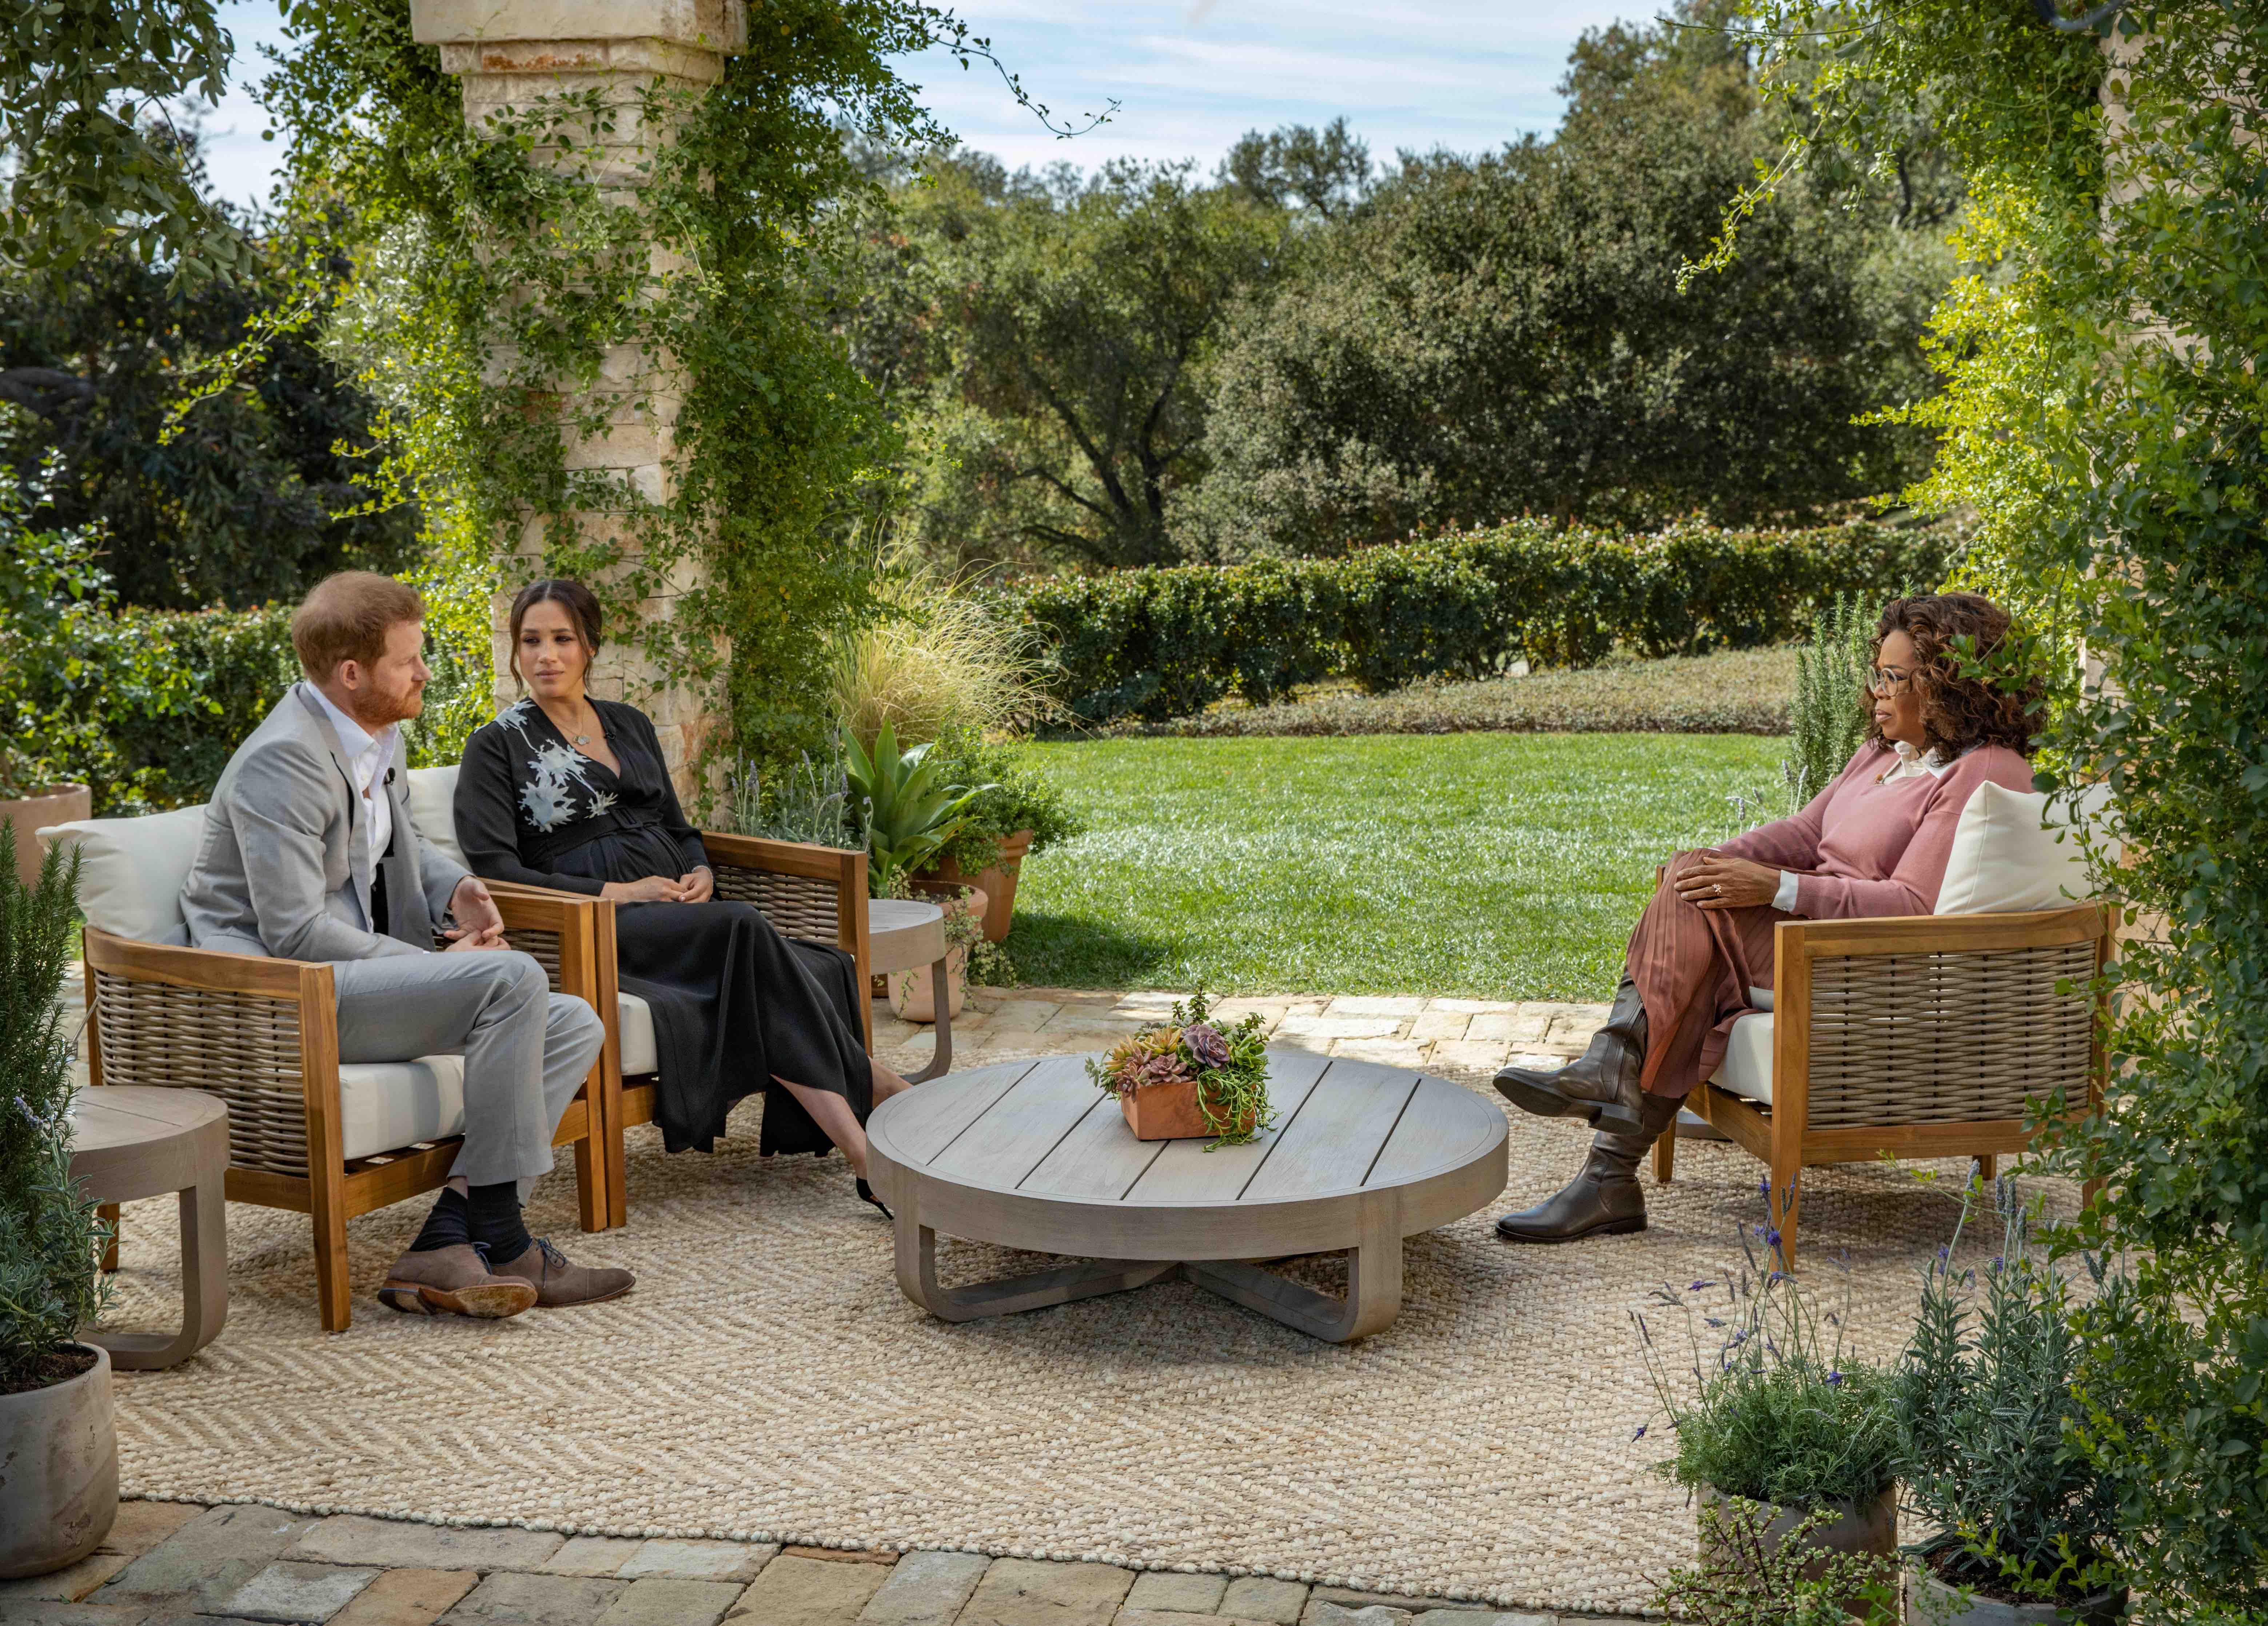 Prince Harry, Duchess Meghan s shocking interview: Serena Williams, Gayle King, Oprah react